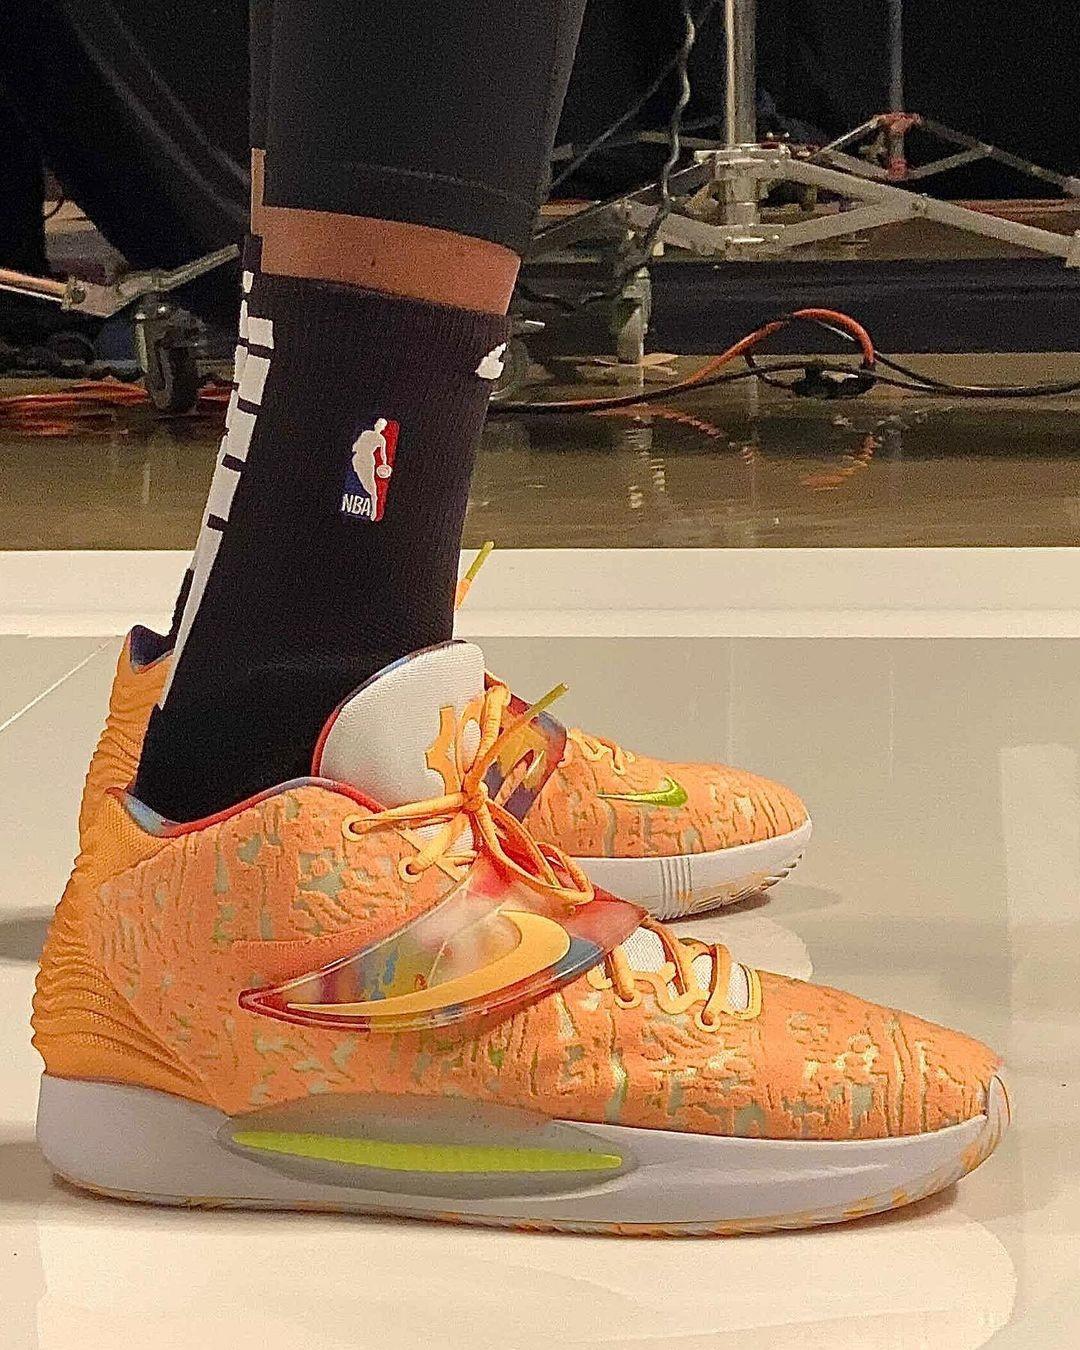 Nike,LeBron 19  詹姆斯亲自上脚!全新「大灌篮」LeBron 19 实物首次曝光!